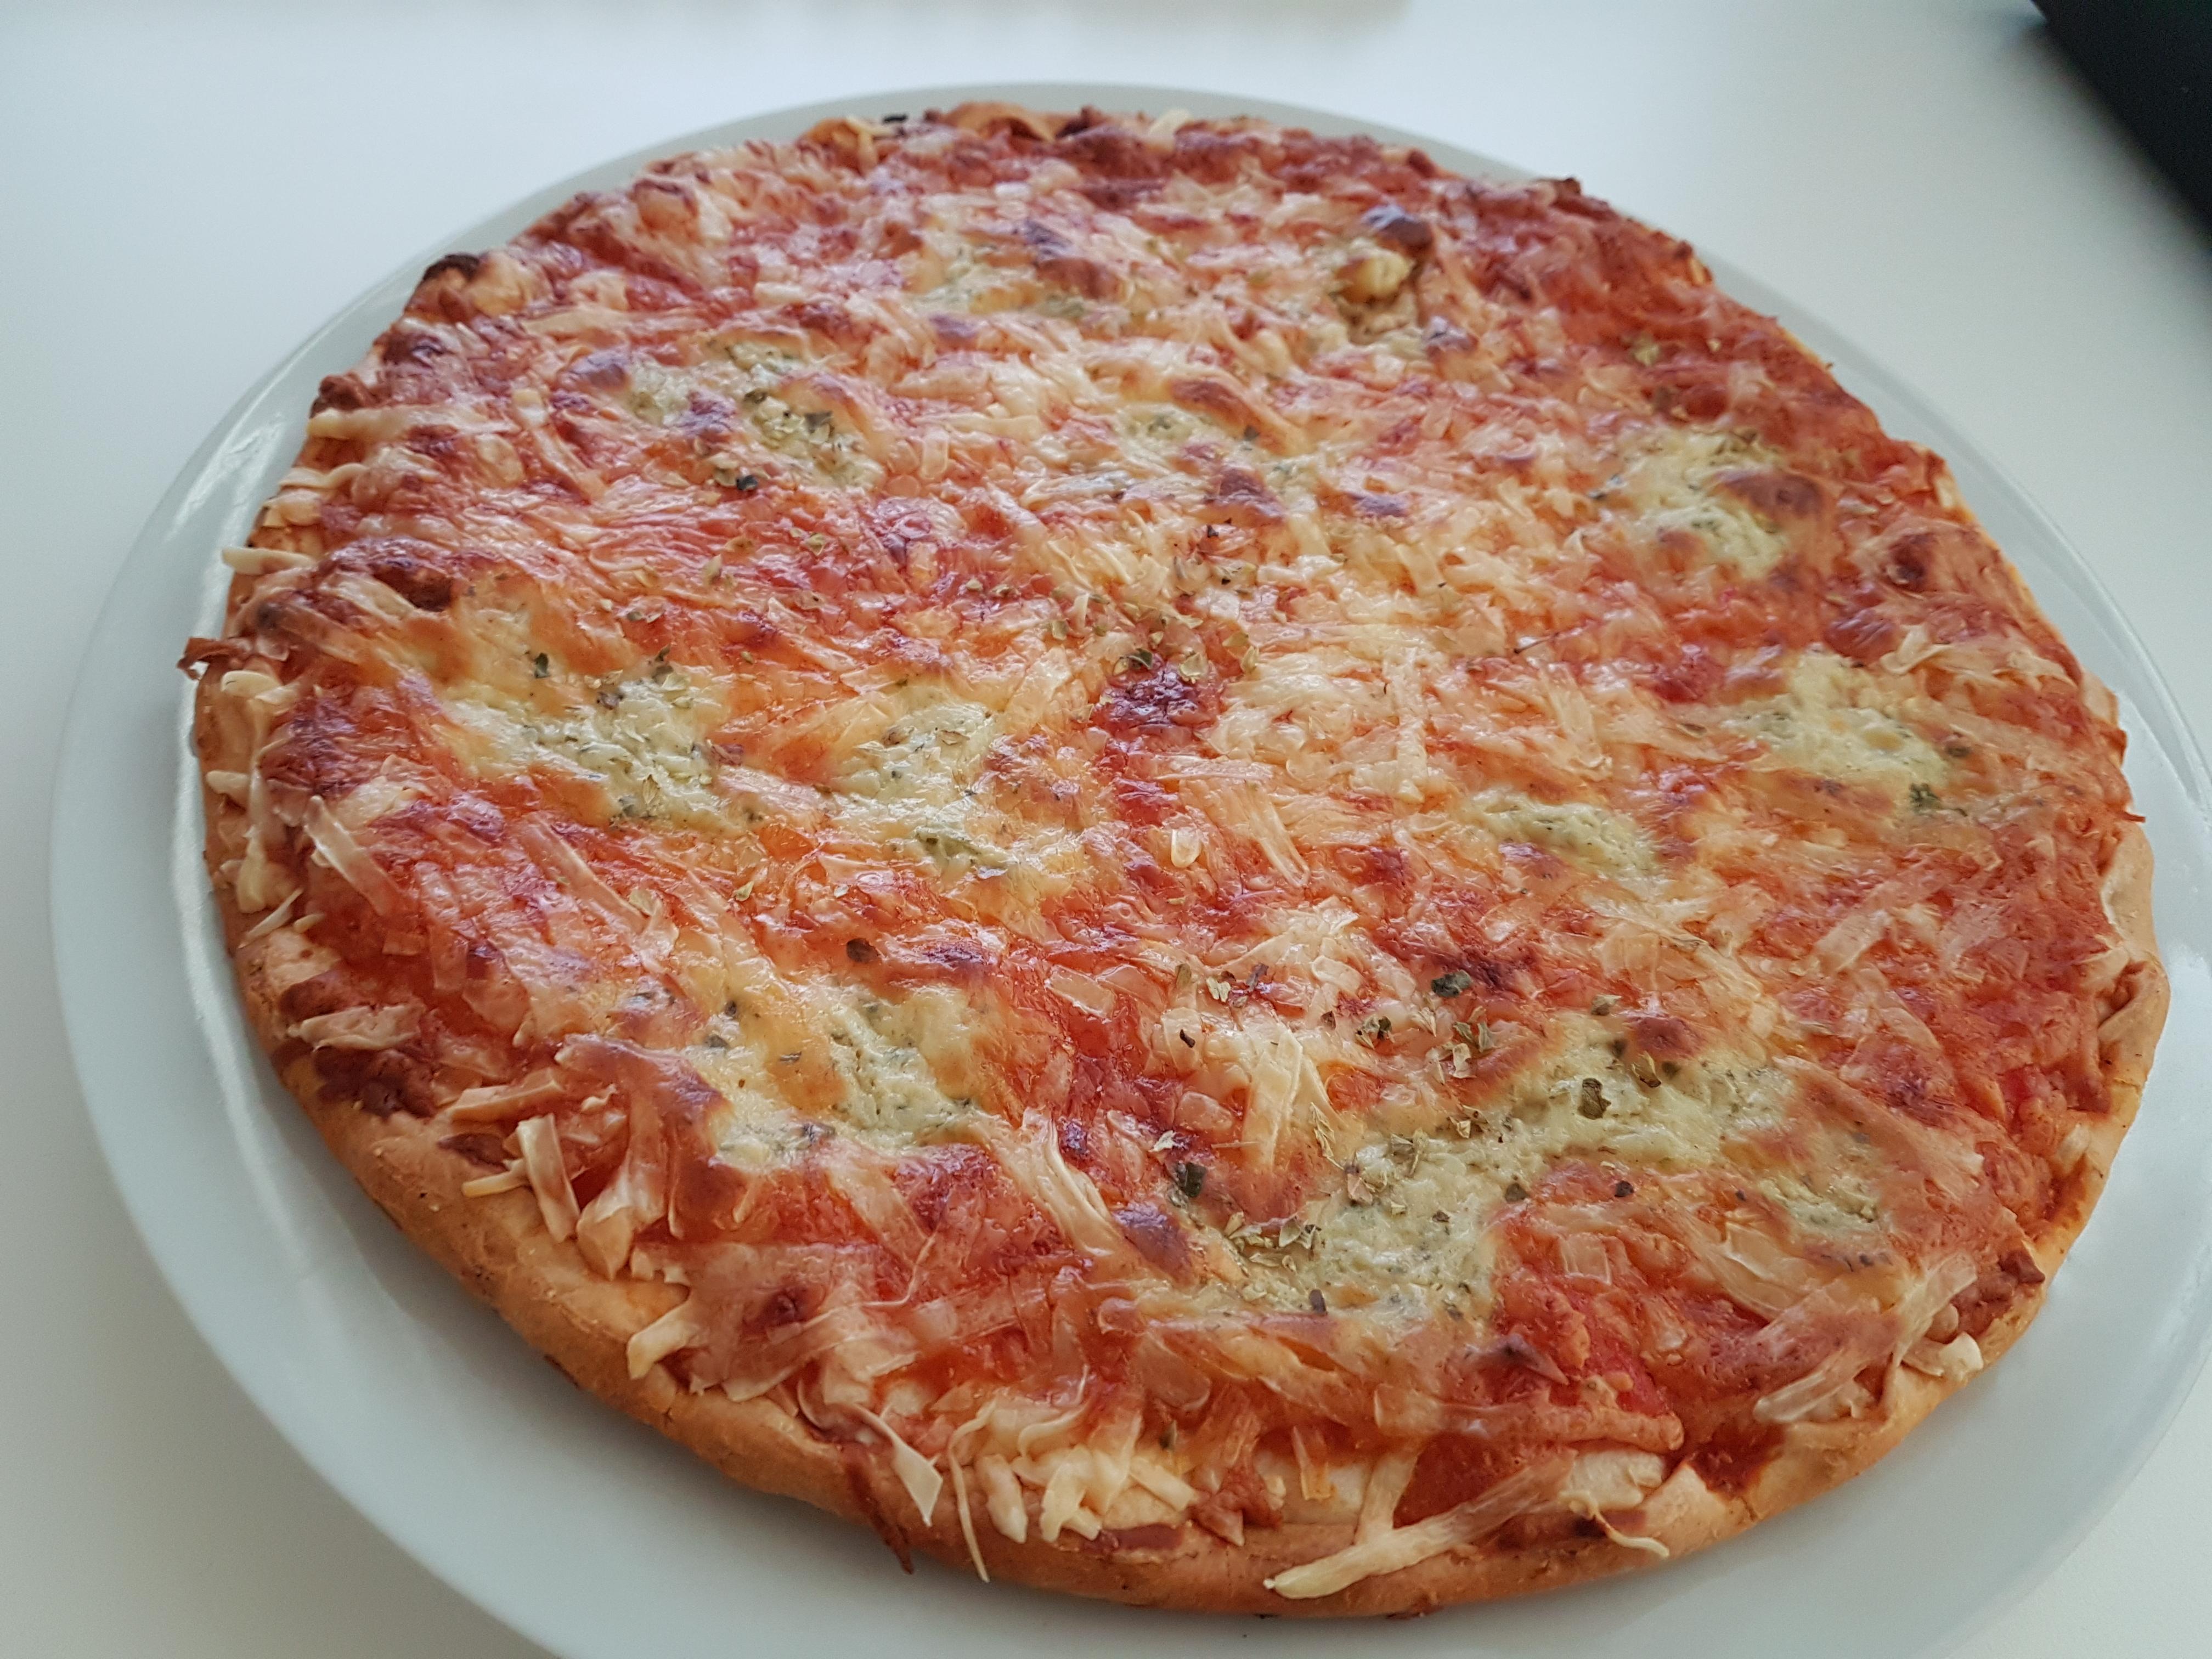 http://foodloader.net/Holz_2018-03-06_Pizza.jpg